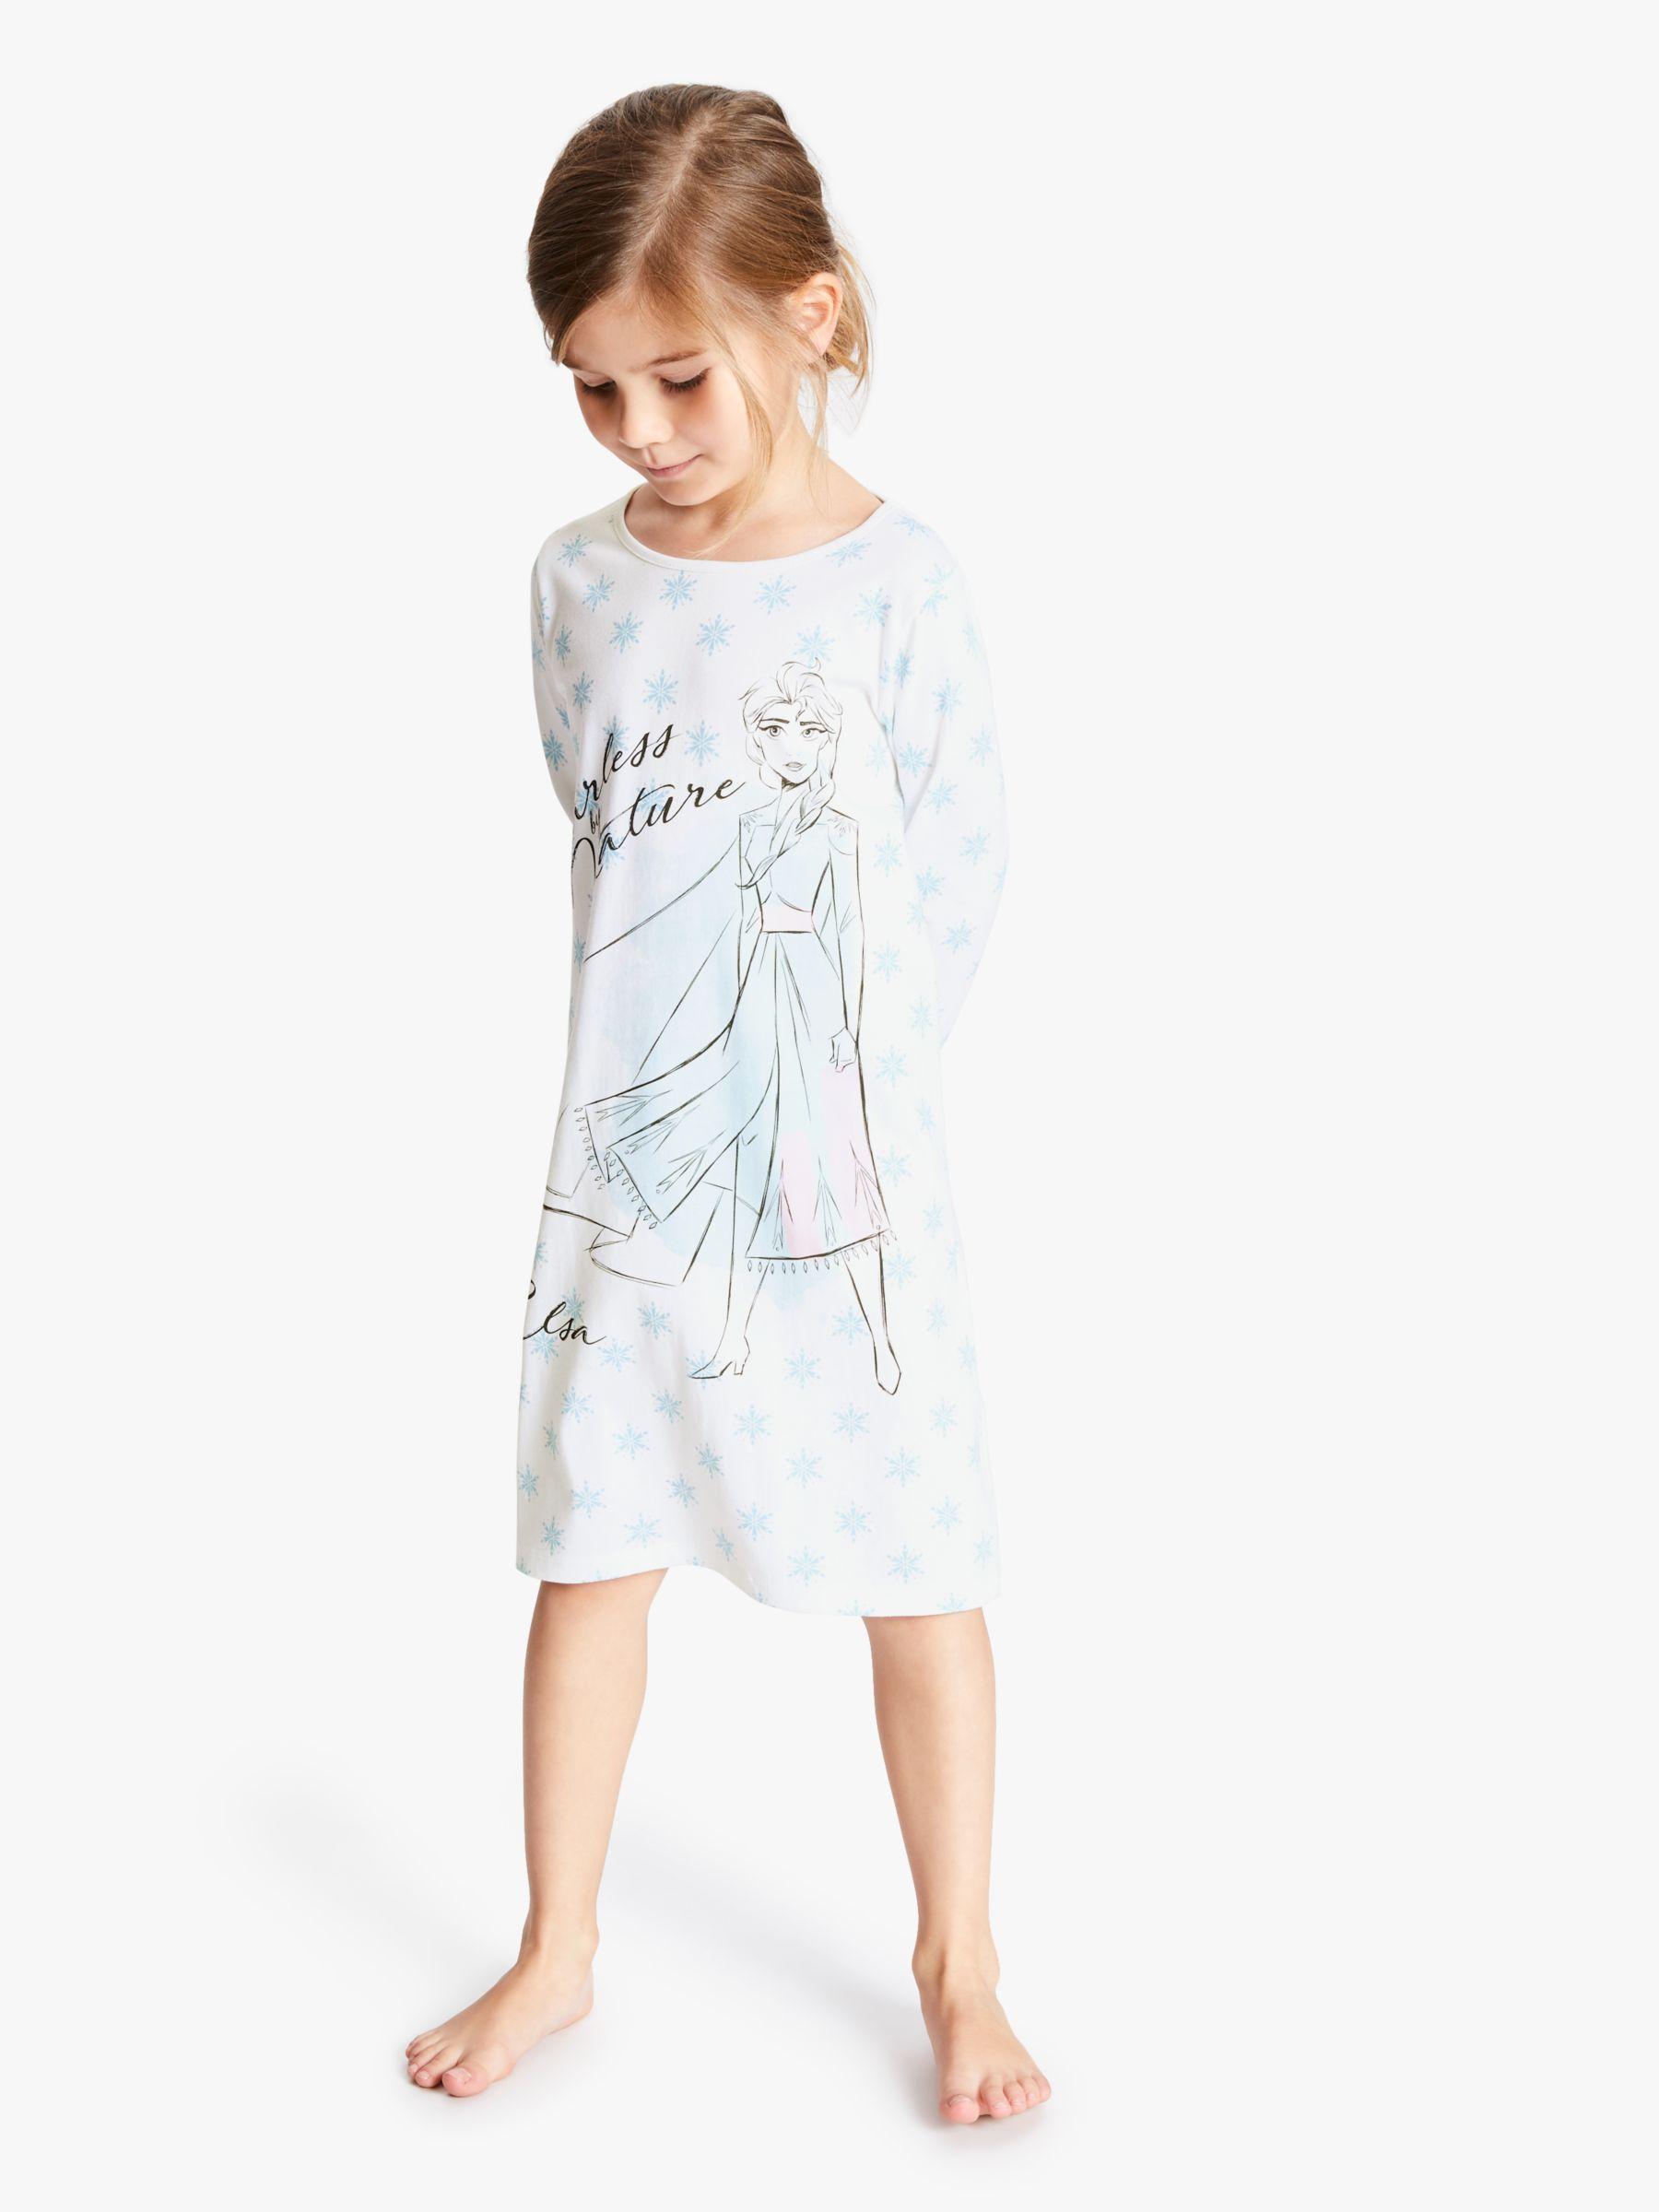 Indepence Life Little Girls Princess Anna and Elsa Long Sleeve Sleepdress Toddler Nightgown Dress